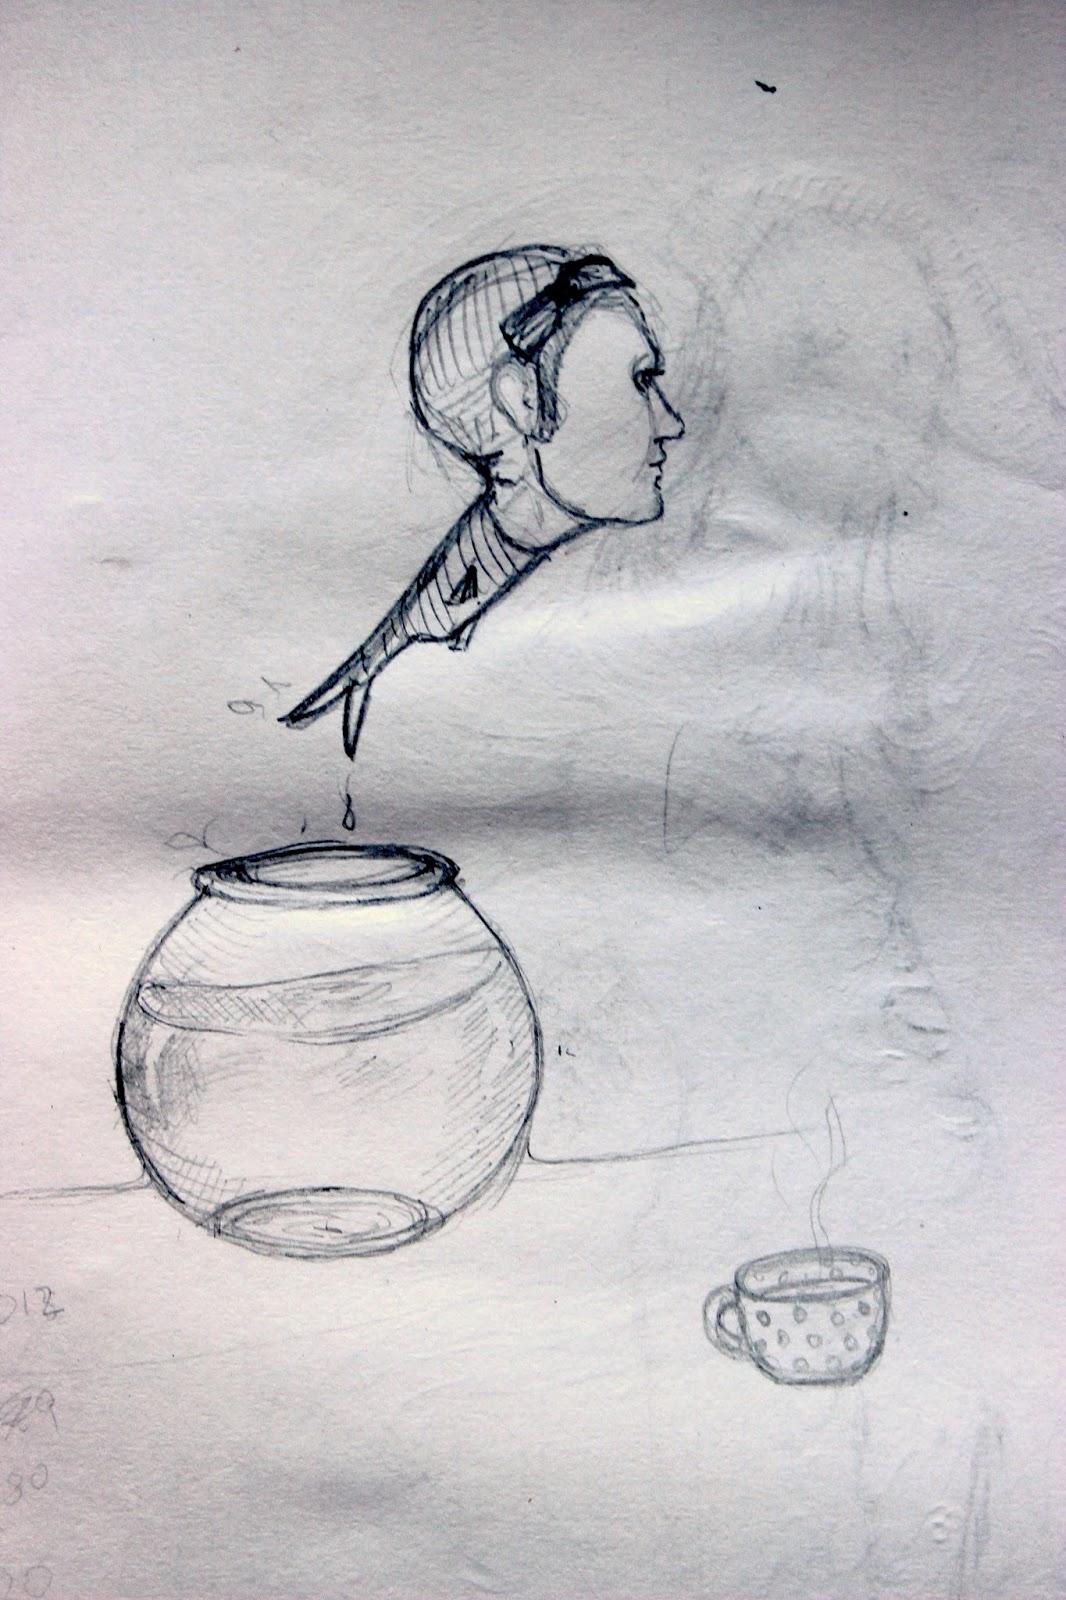 Sketchpad Notebook Sketch Drawing Pencil Pen Fishbowl Fish Man Head